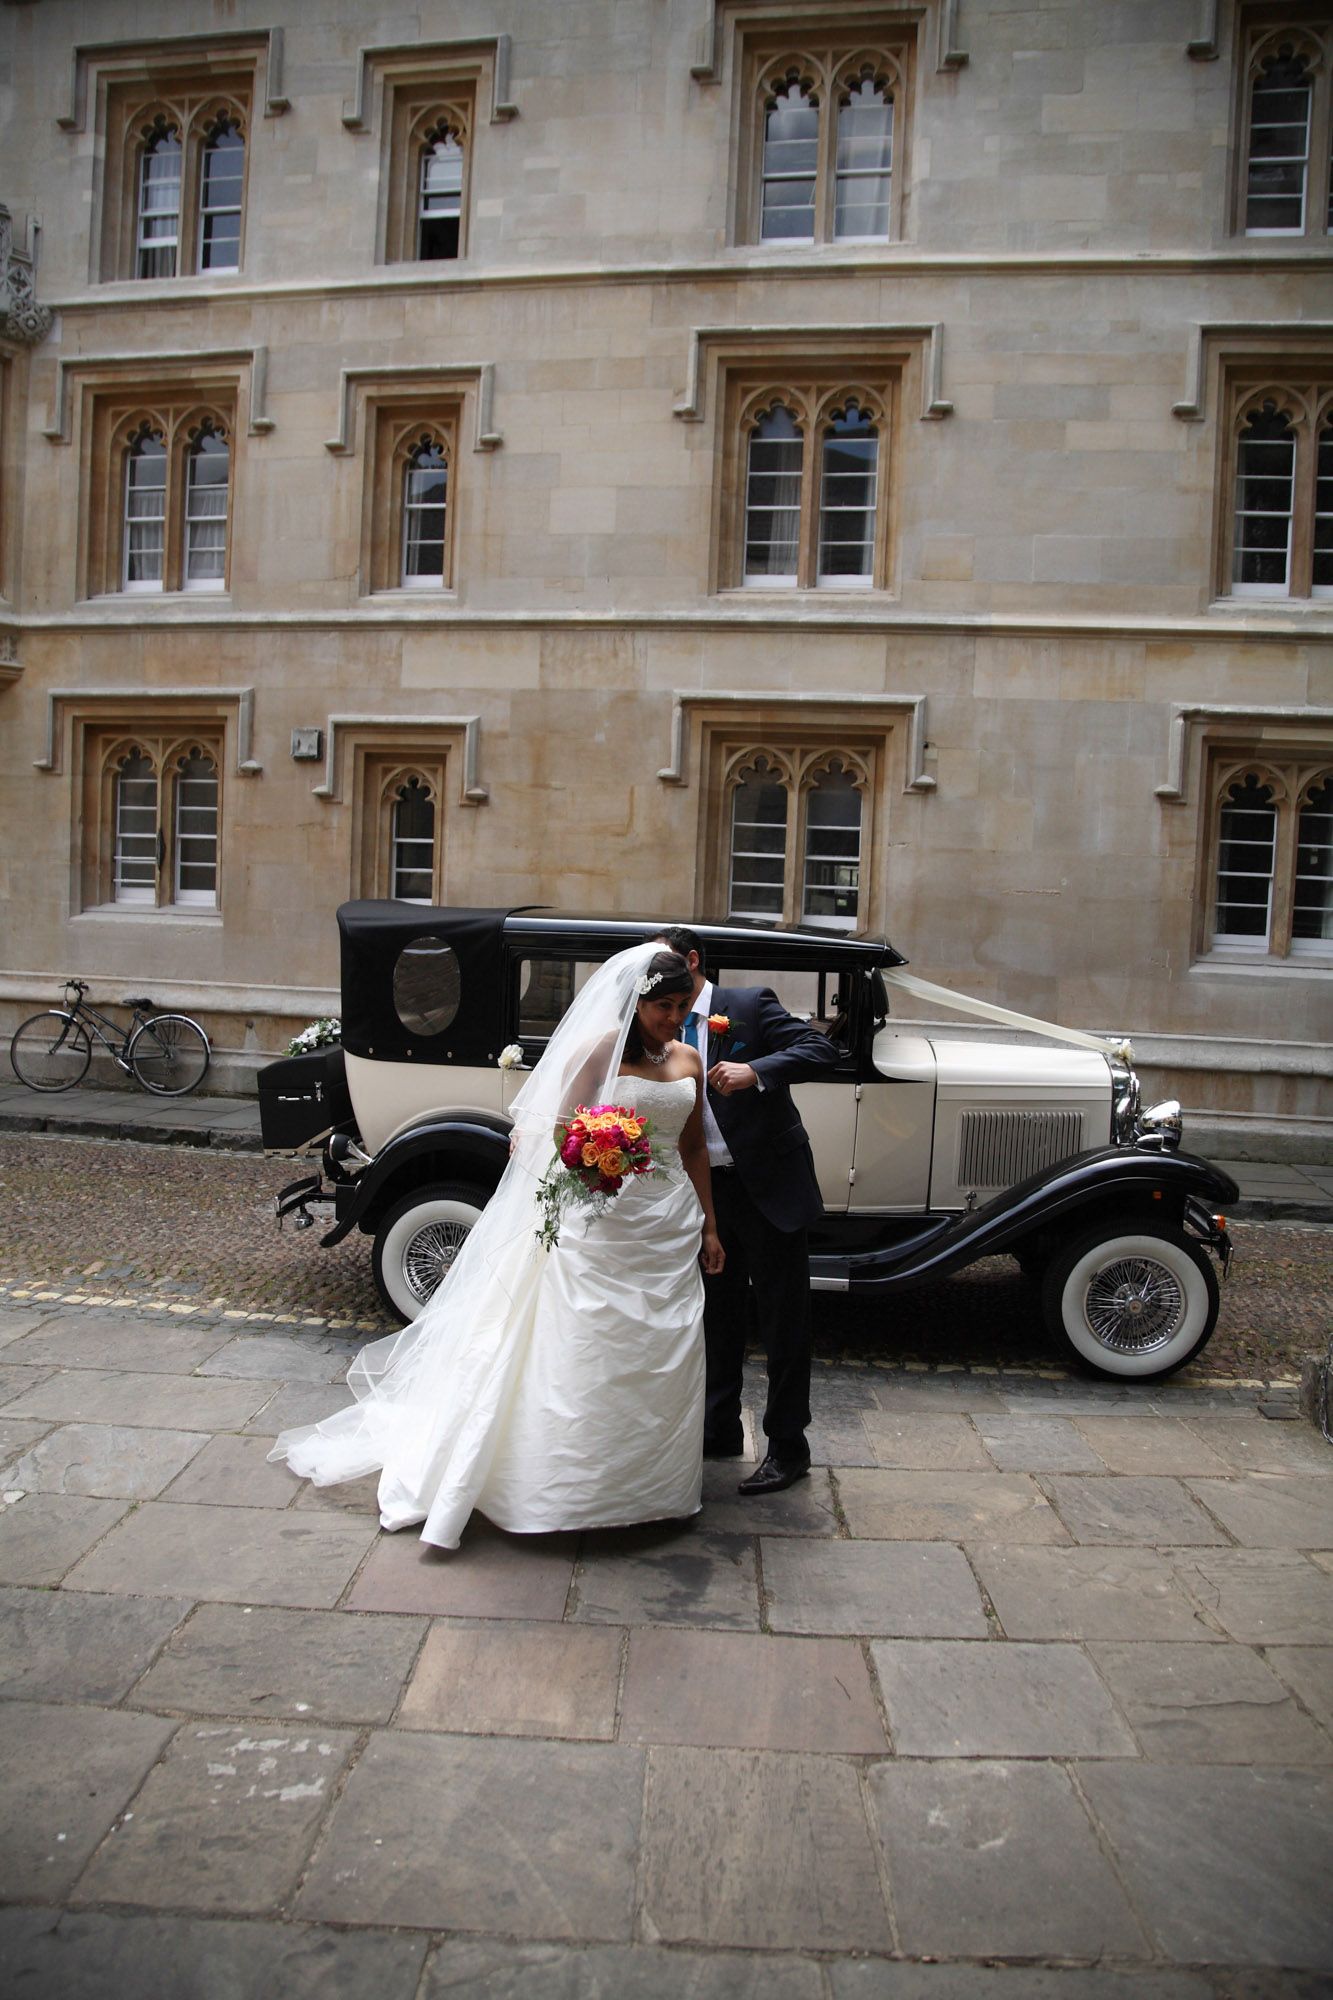 weddings-couples-love-photographer-oxford-london-jonathan-self-photography-15.jpg